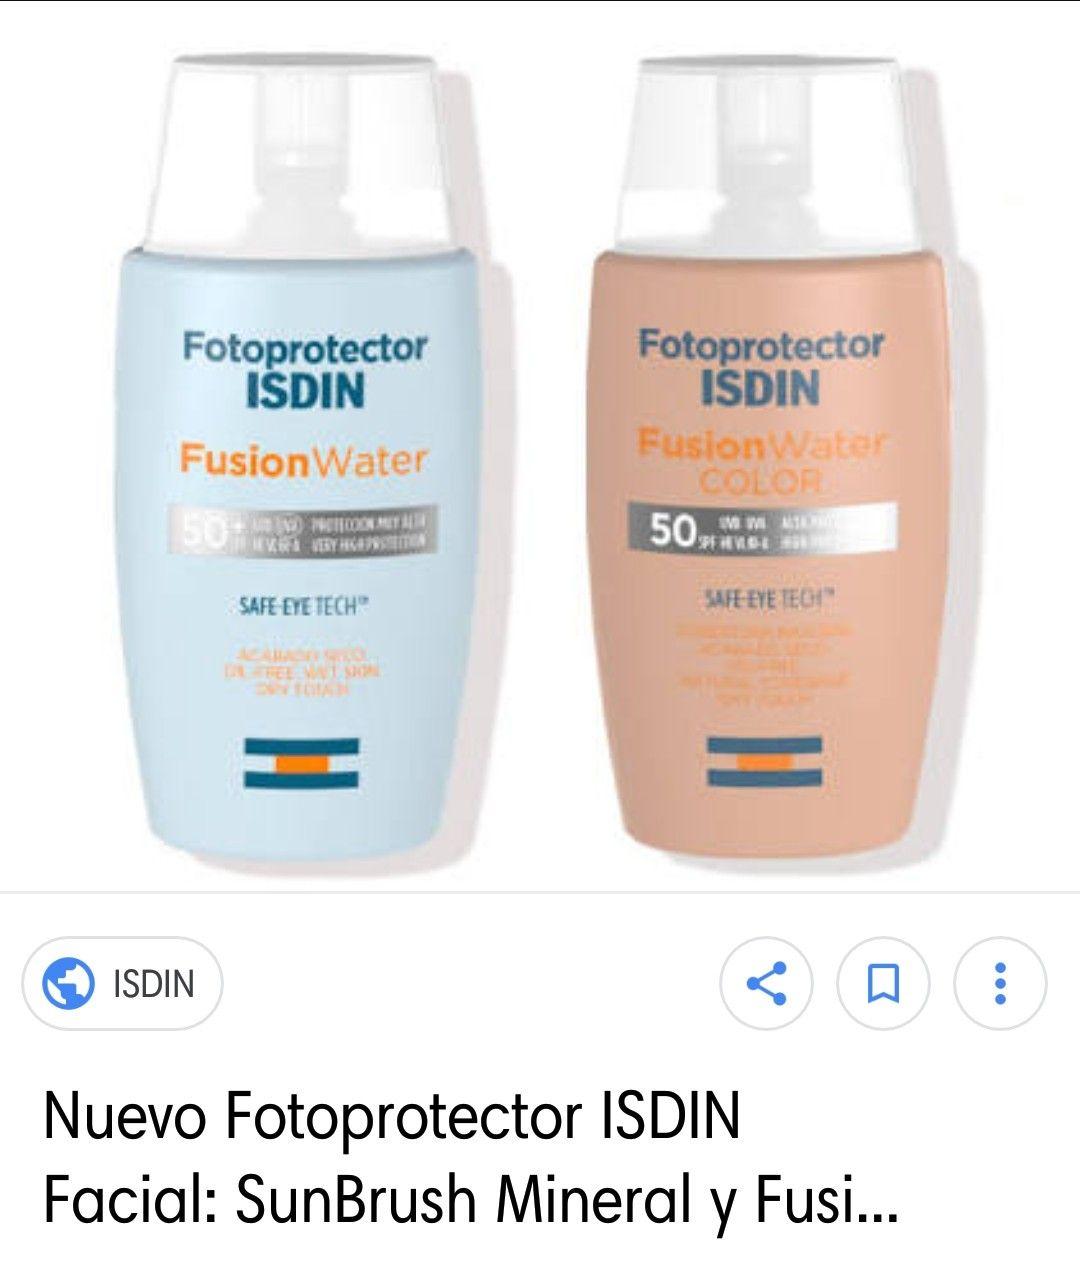 Fotoprotector Isdin Fusion Water Oil Control Beleza E Cia Beleza